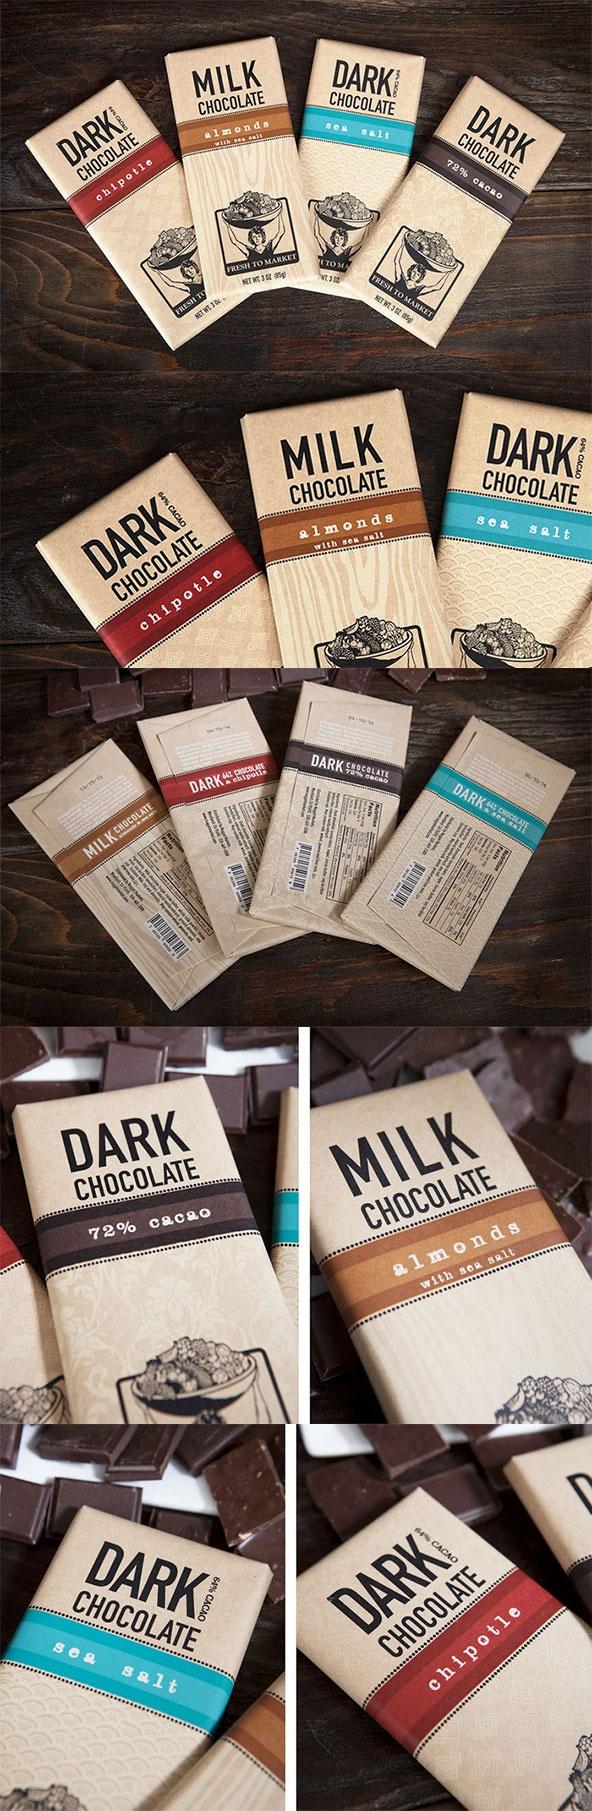 Chocolate #packaging